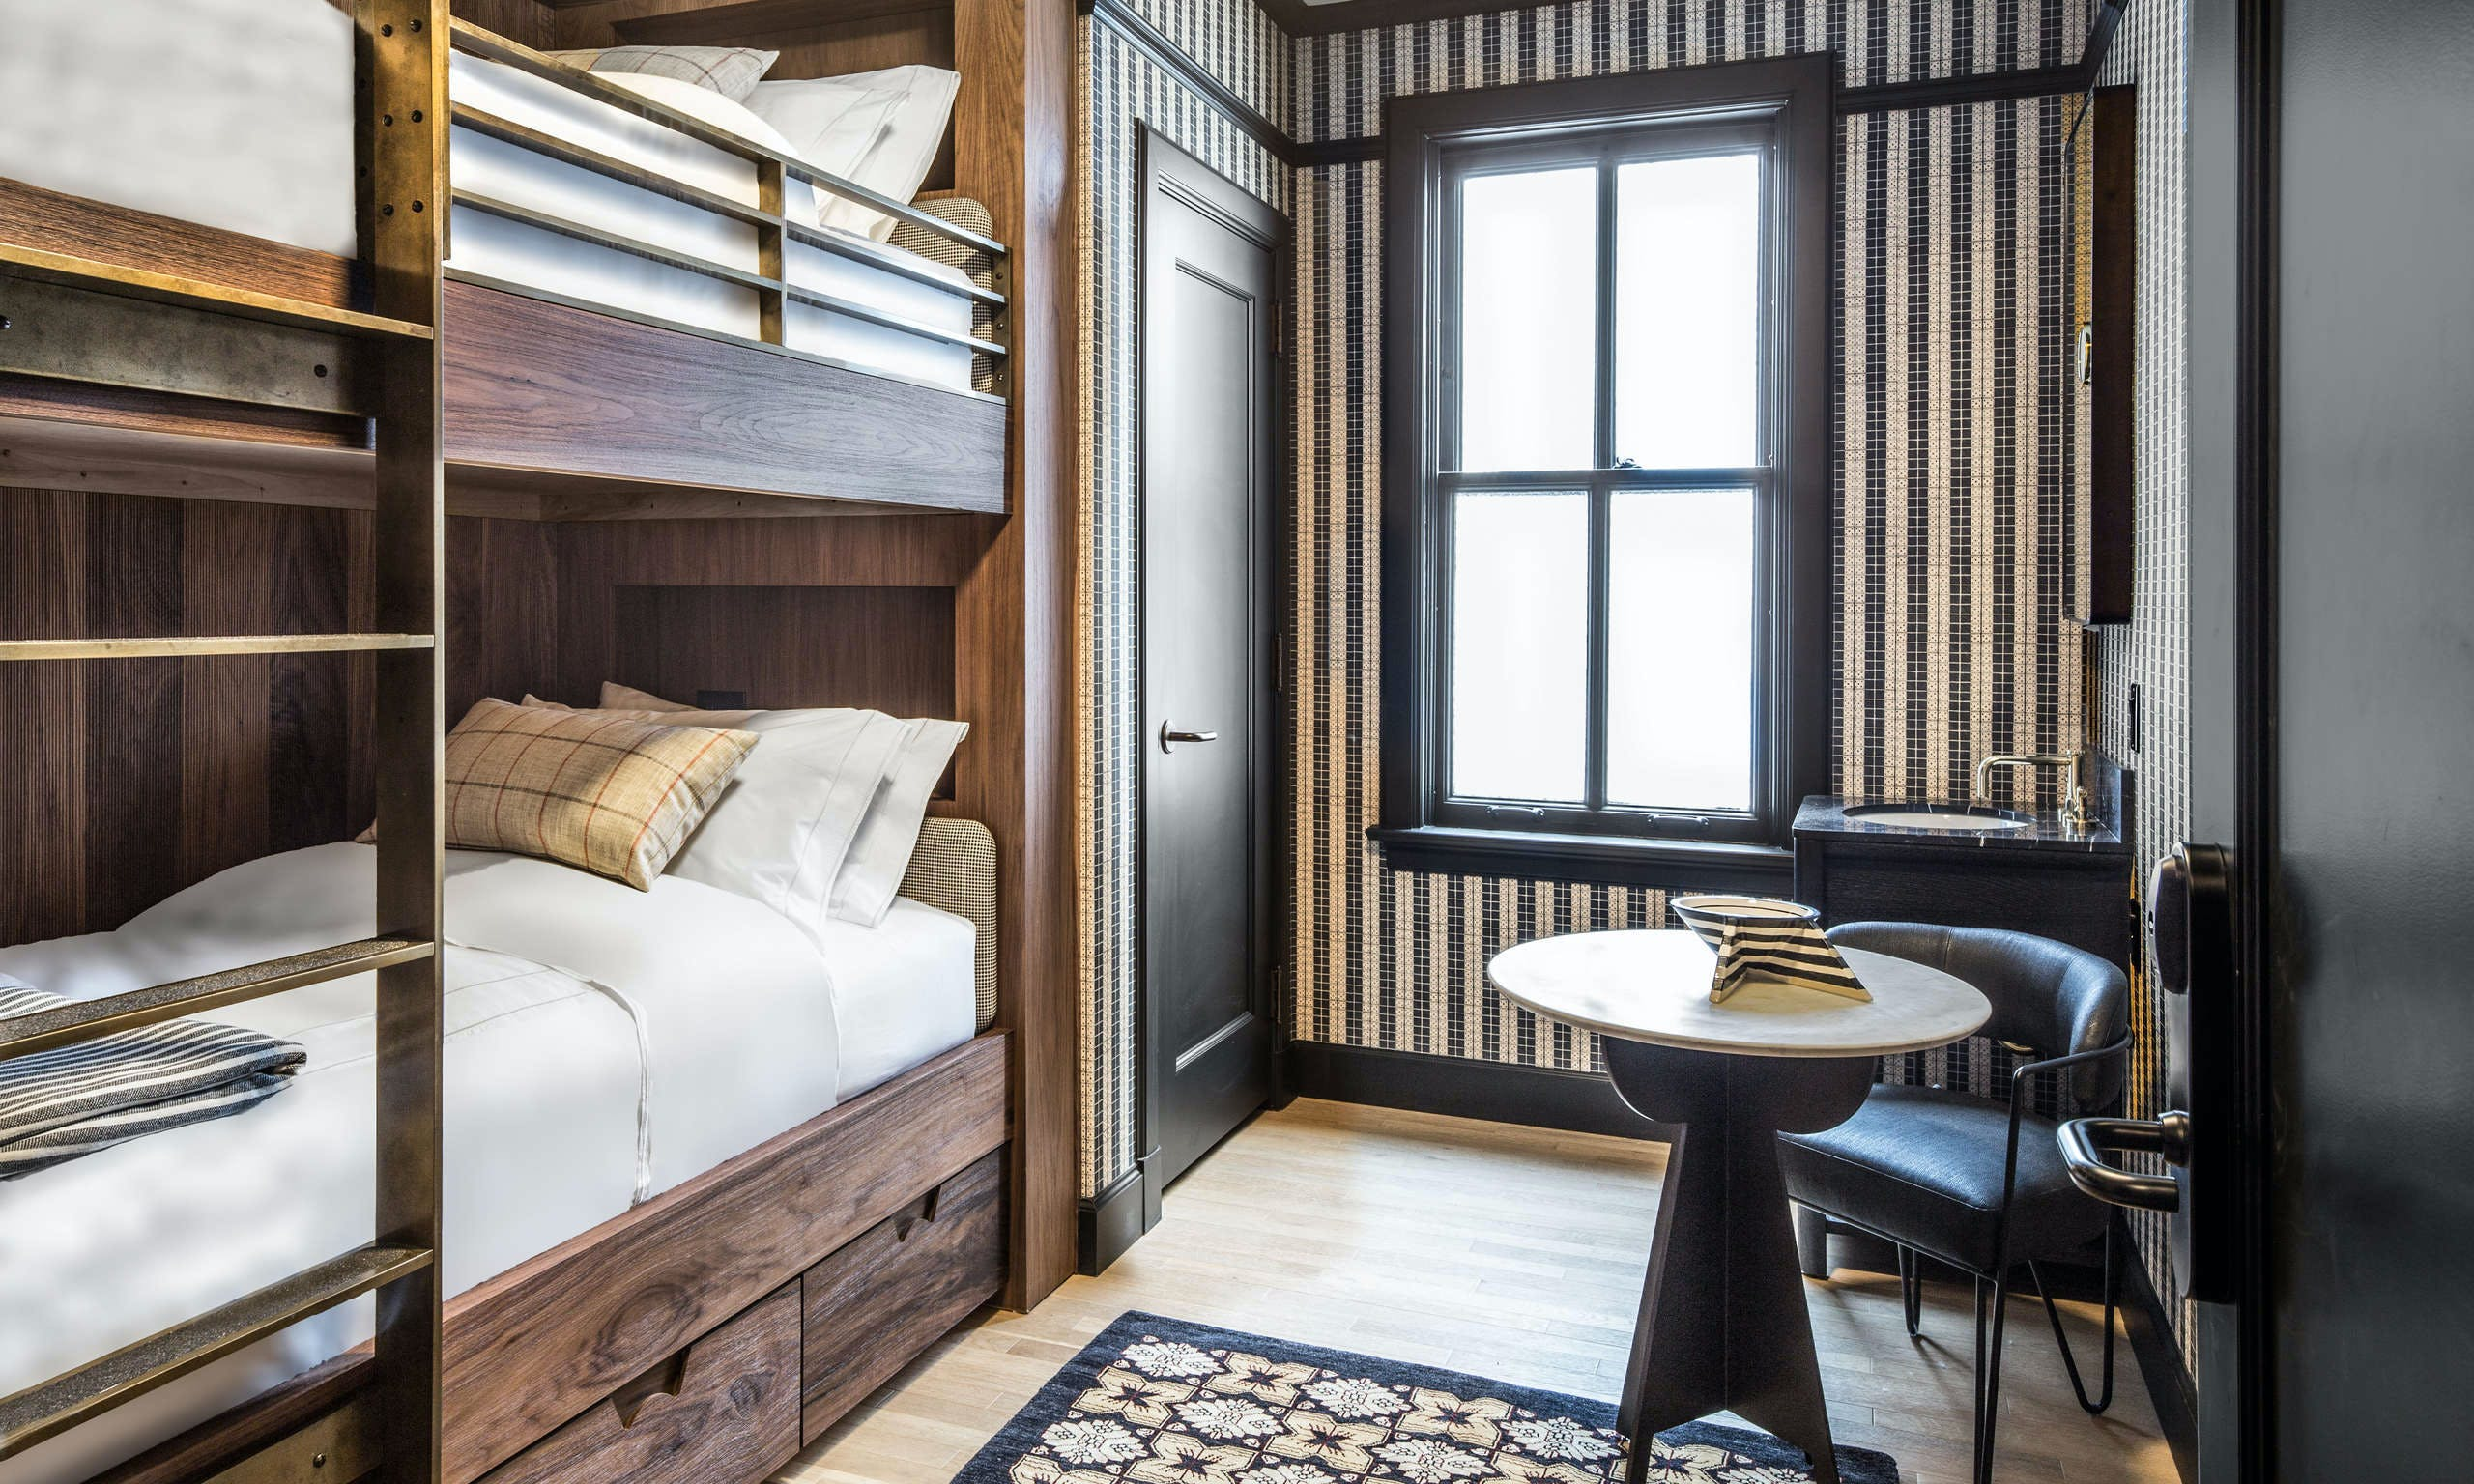 San Francisco Proper Hotel - Bunk Bed Room